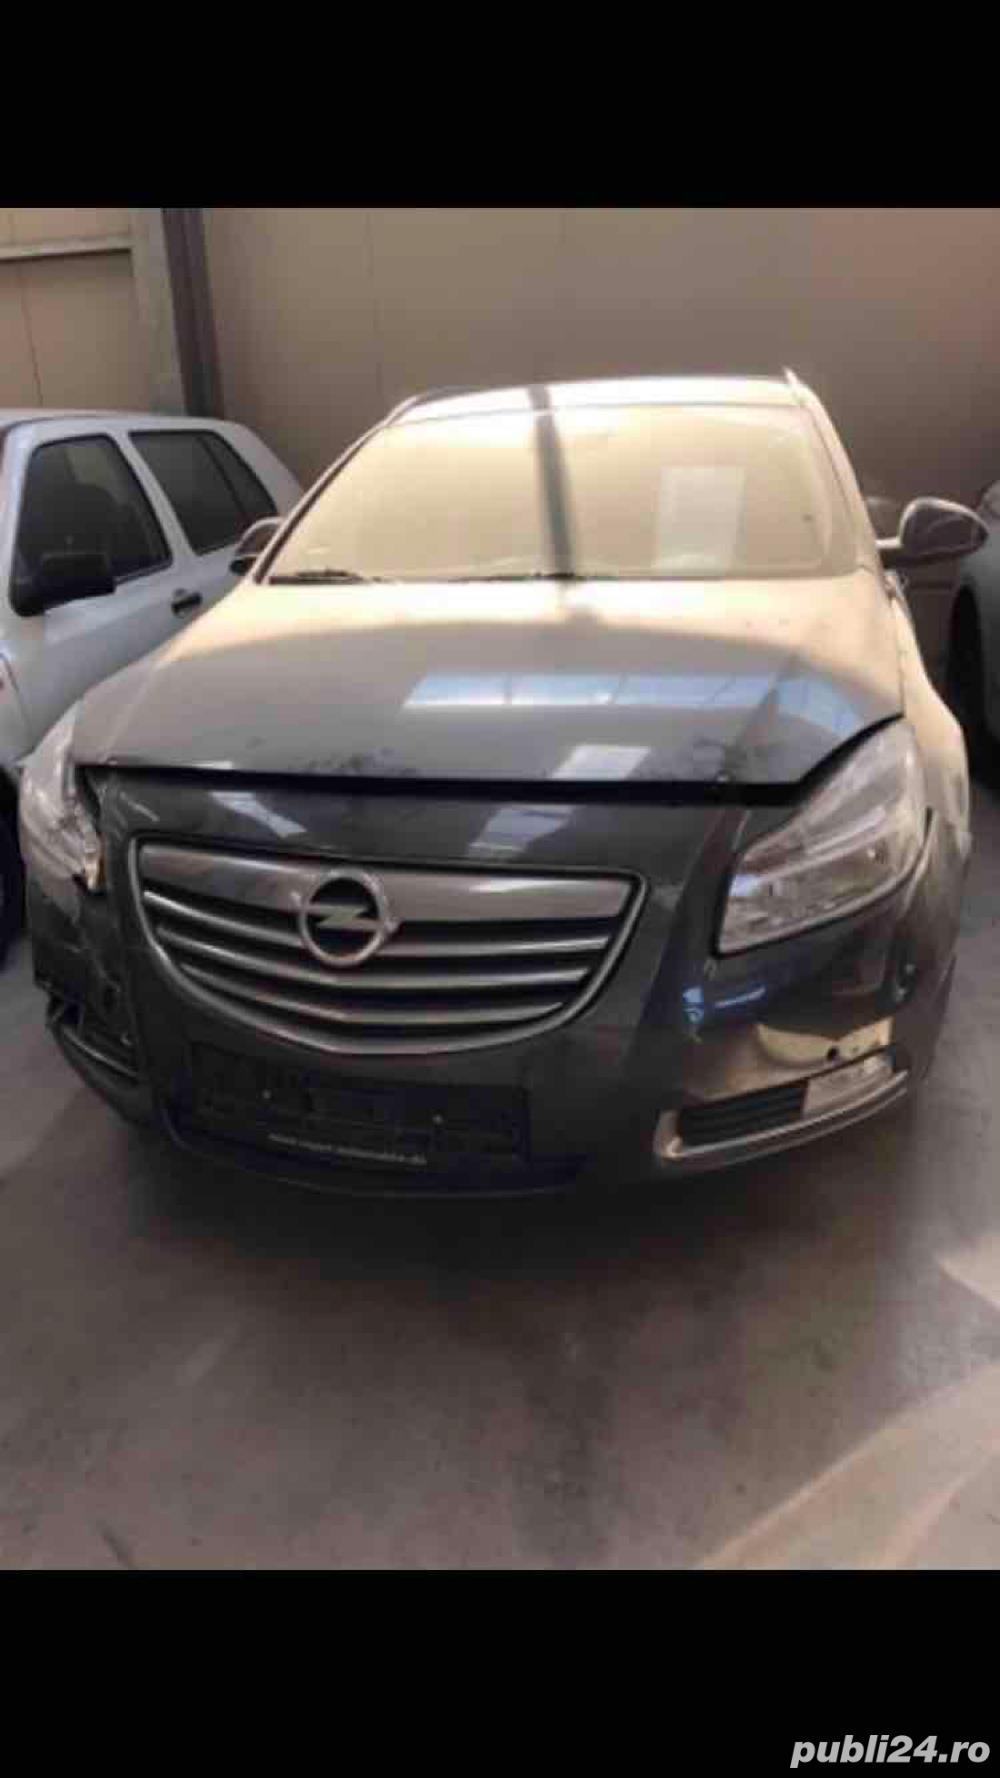 Dezmembrez Opel Insignia Sports Tourer motor 2.0 cdti 160 cp A20DTH